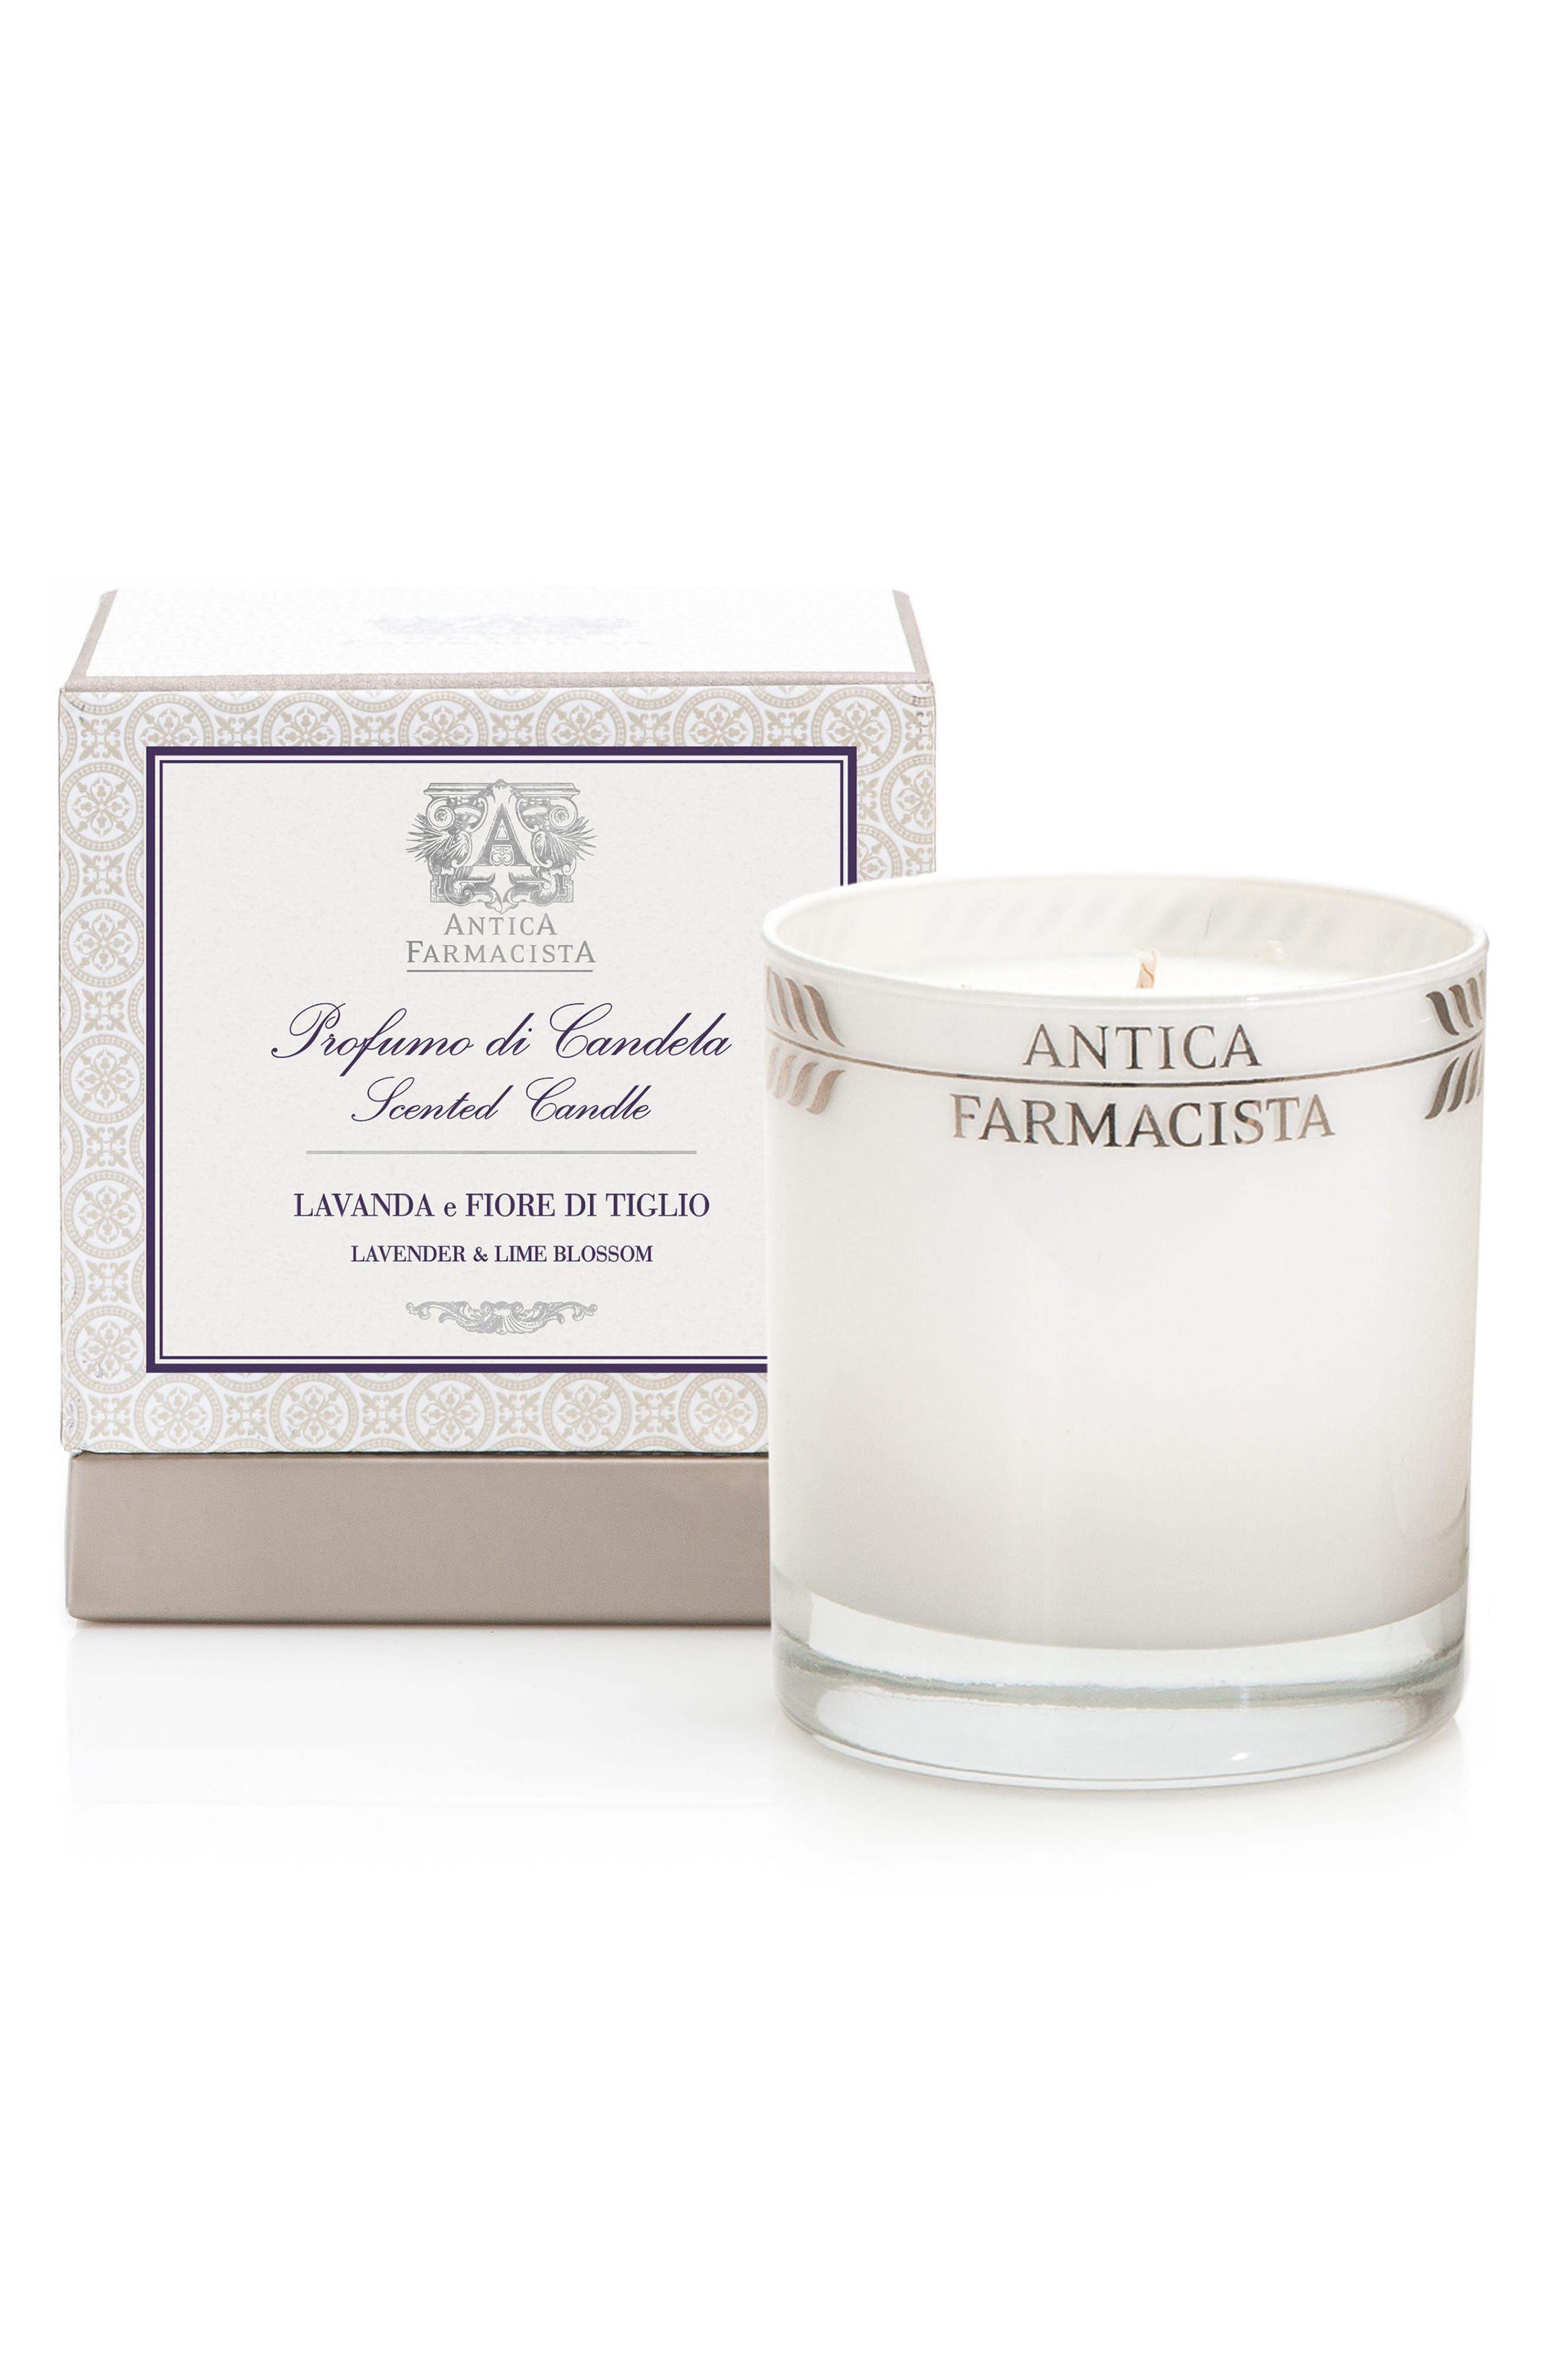 Antica Farmacista Lavender & Lime Blossom Candle